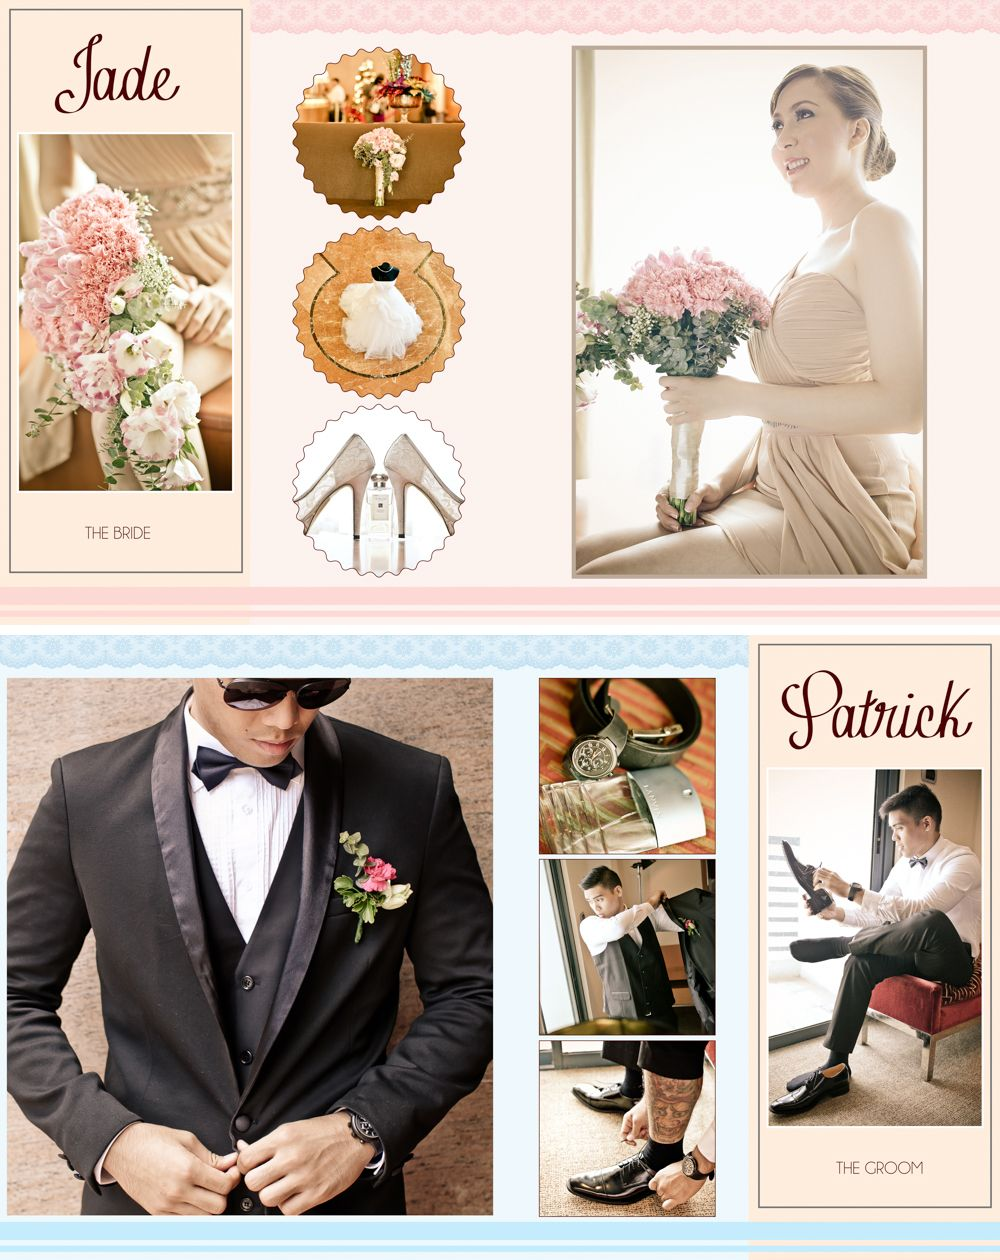 8x10 Wedding Album Layout Justmarried Patrickandjade Weddinglayout Wedding Album Layout Wedding Album Bride